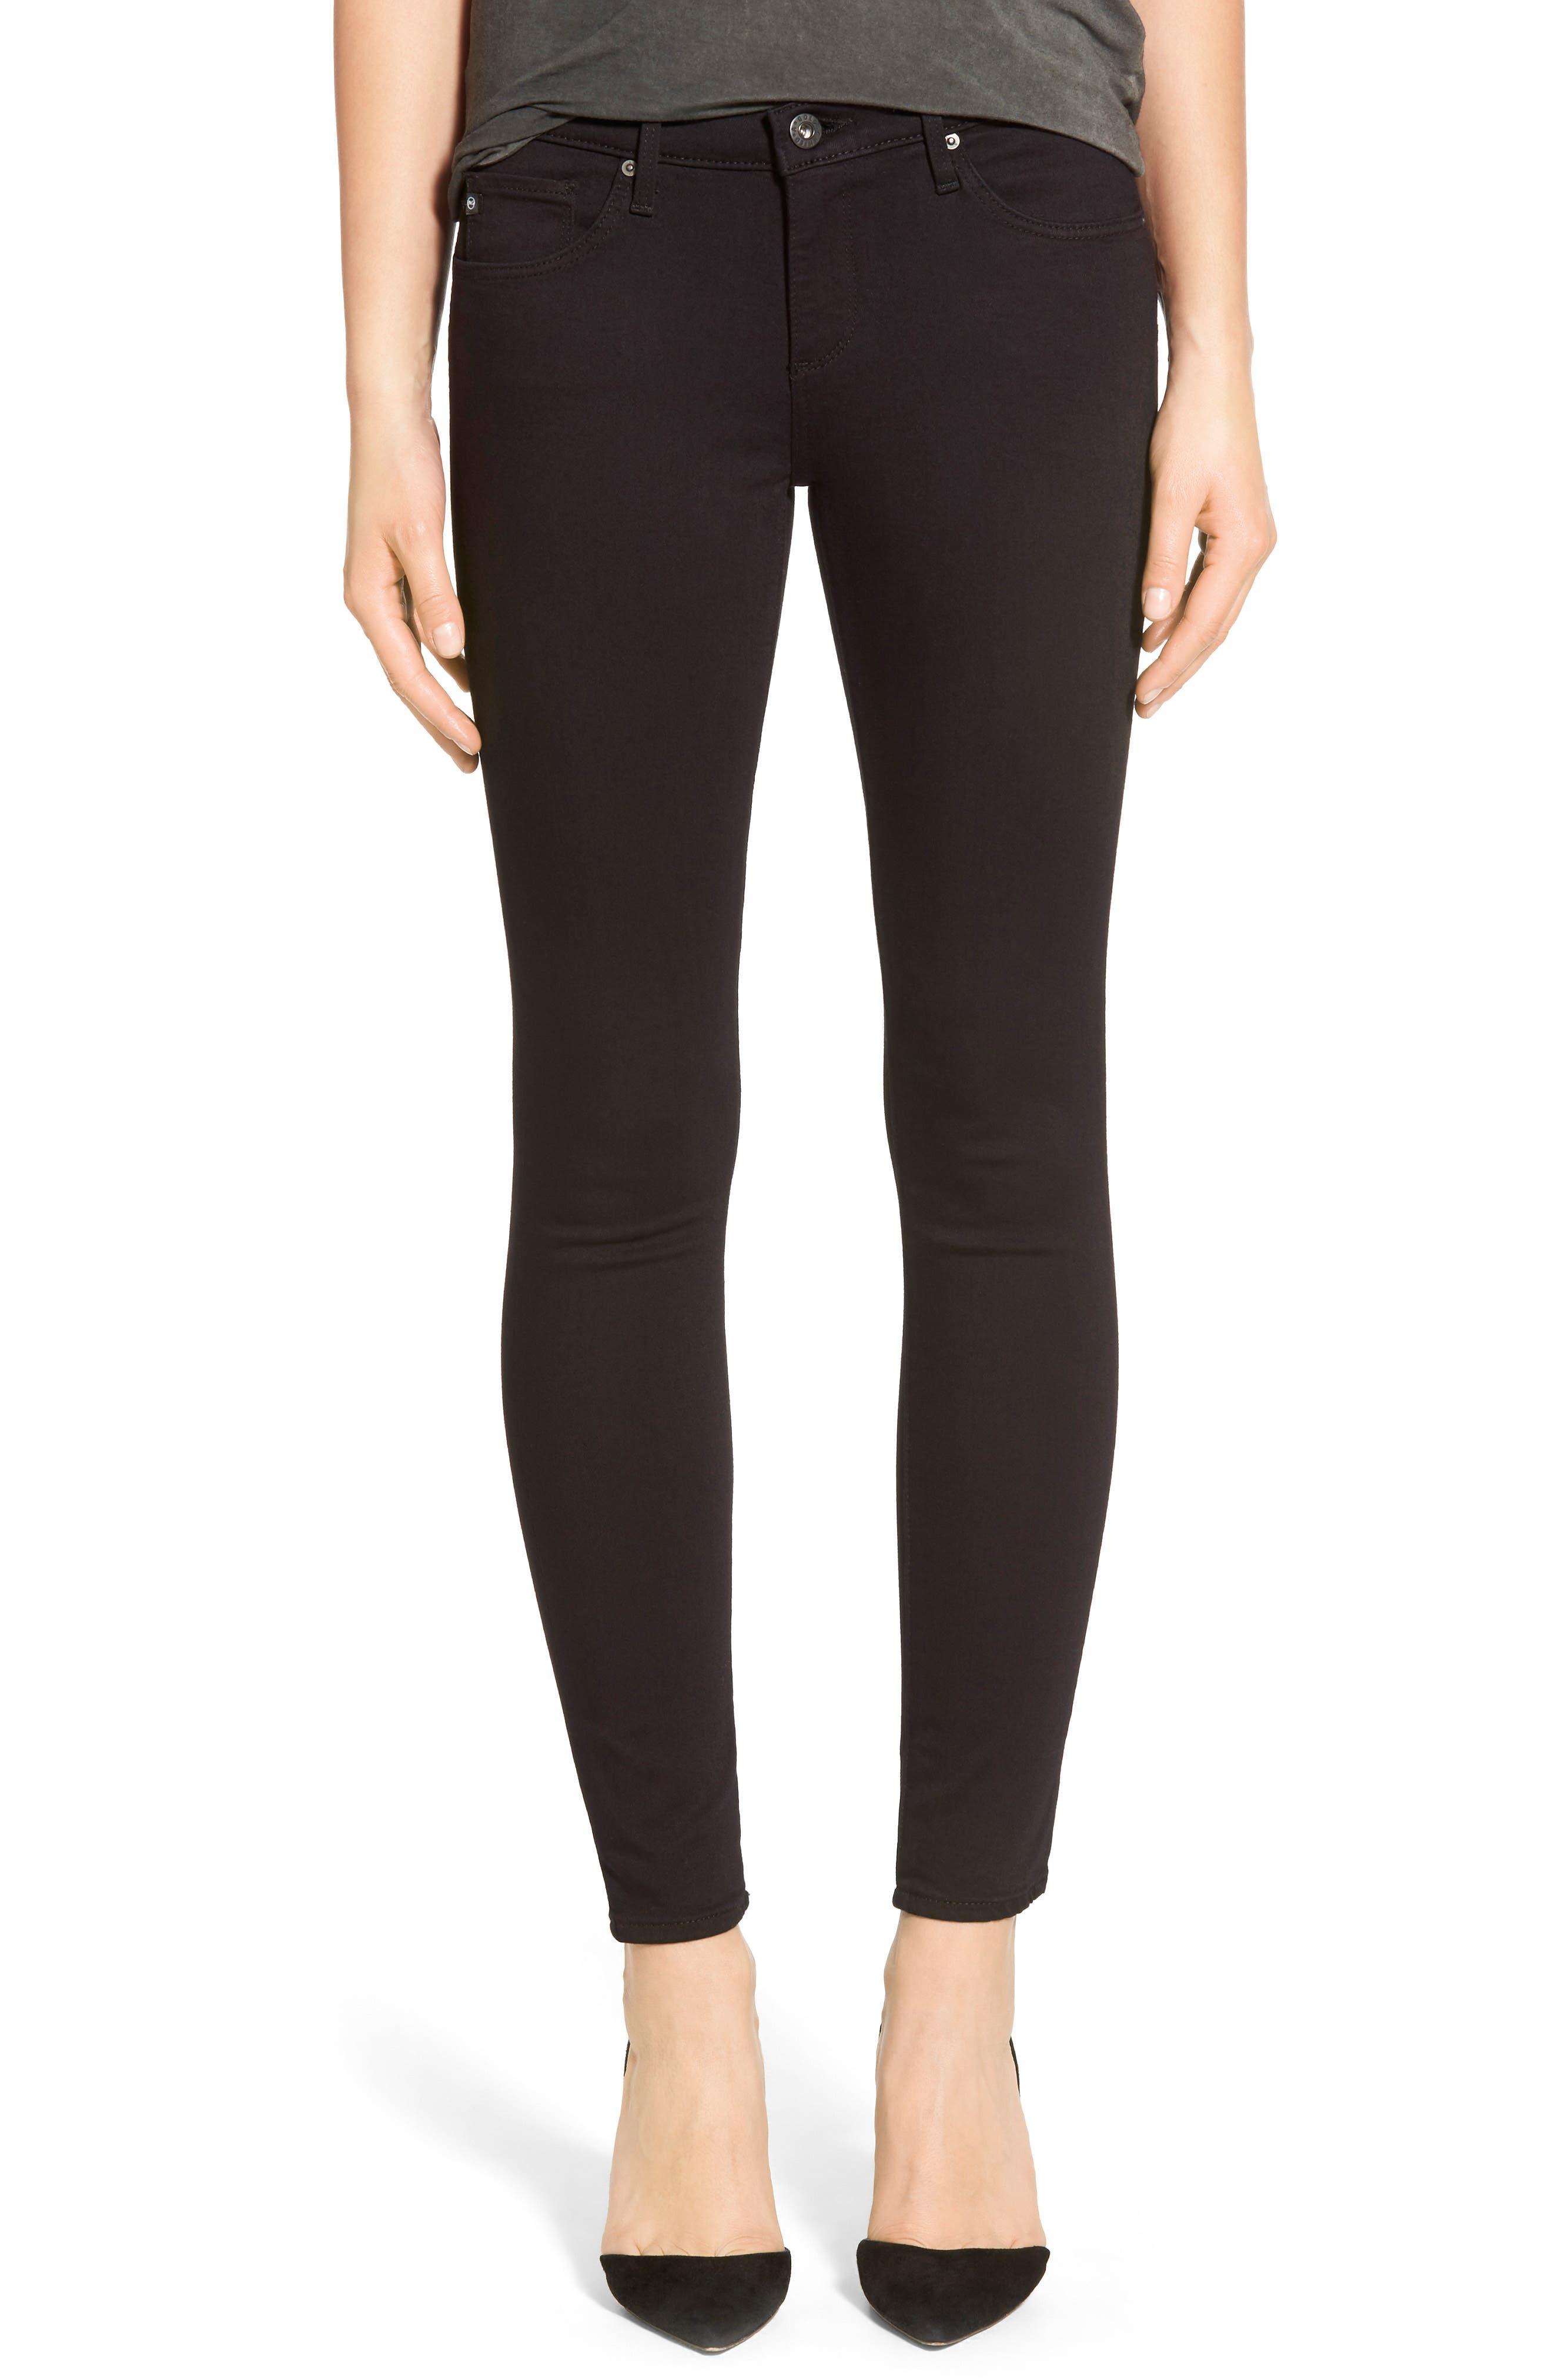 AG, 'The Legging' Ankle Super Skinny Jeans, Main thumbnail 1, color, SUPER BLACK